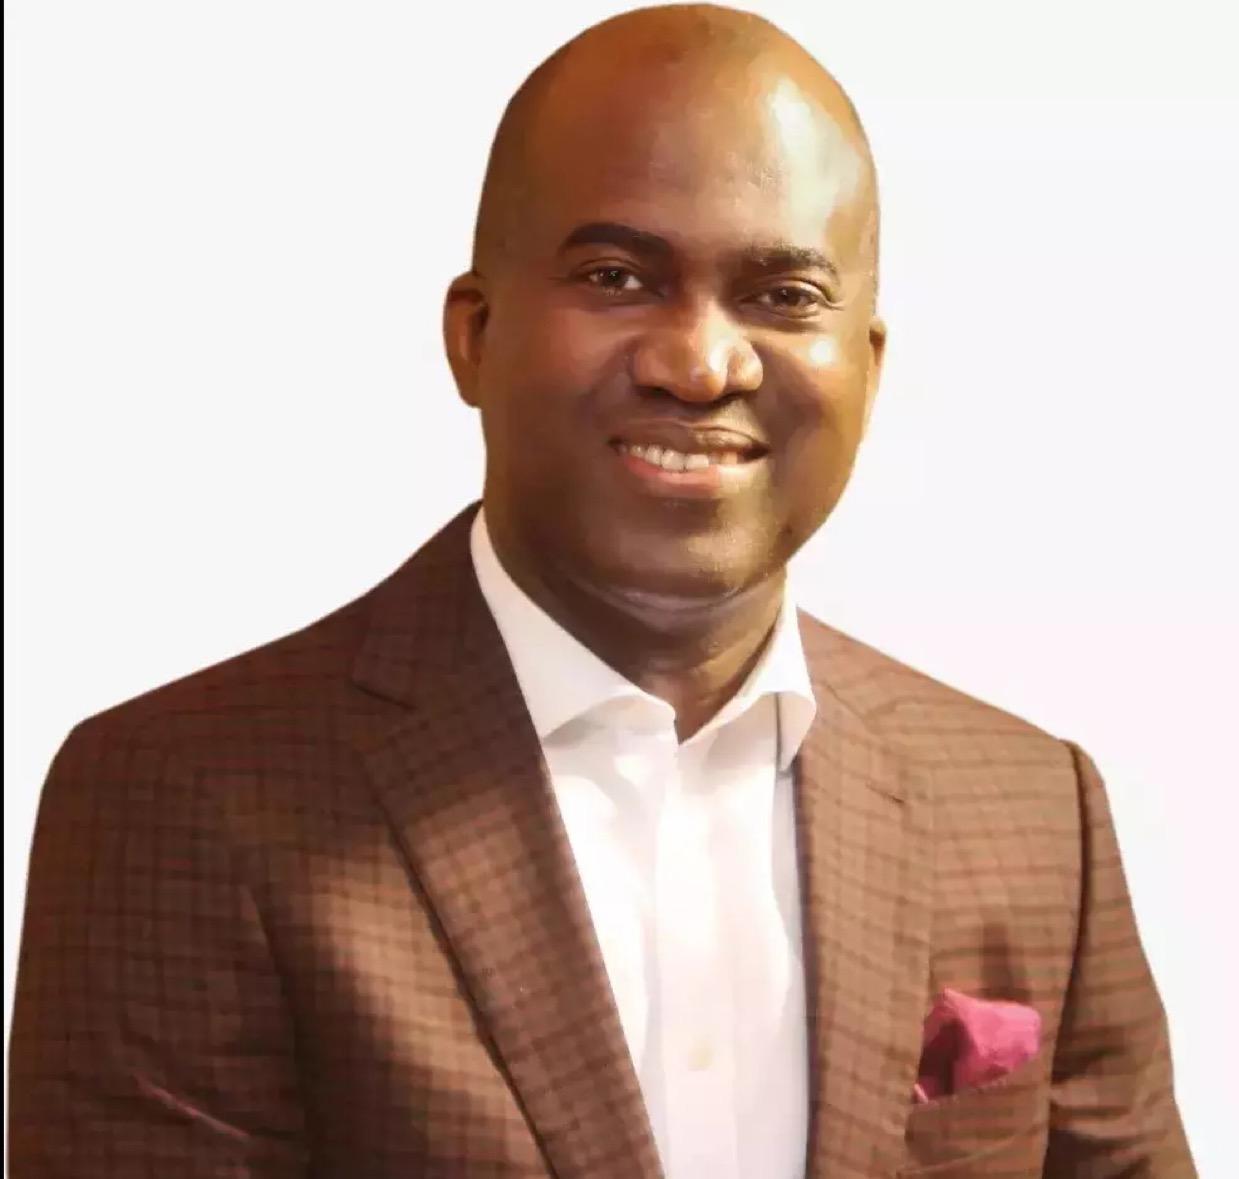 Happy birthday dearest Pastor sir,